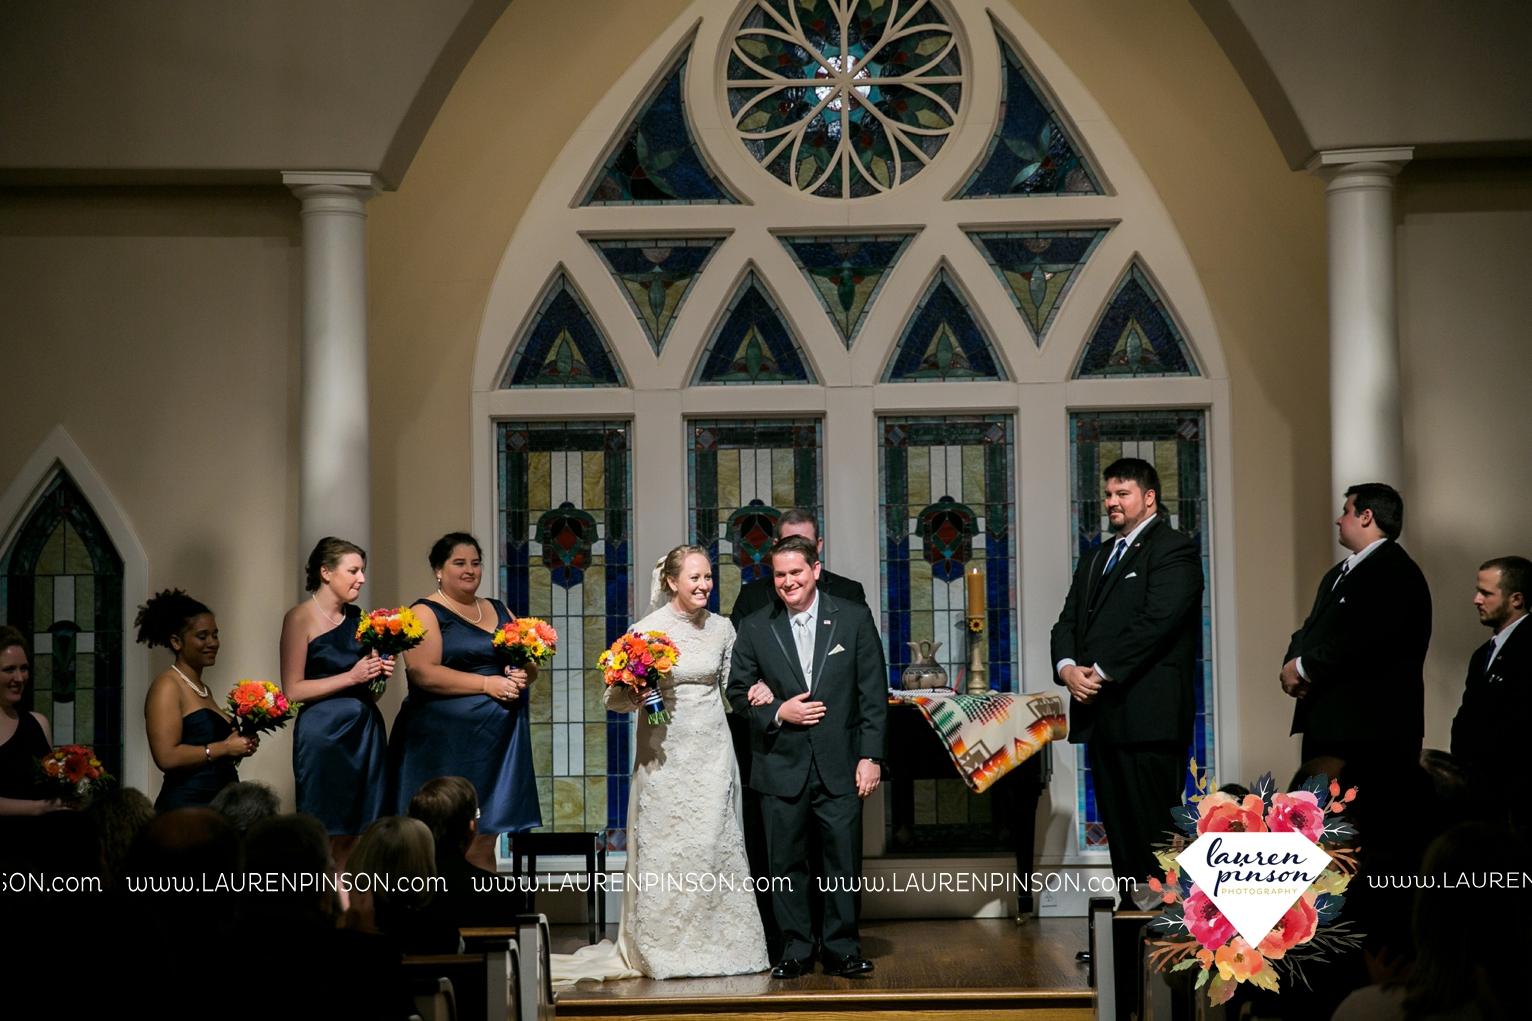 bells-texas-wedding-photography-at-willowood-ranch-chapel-north-texas-wichita-falls-wedding-photographer_1877.jpg